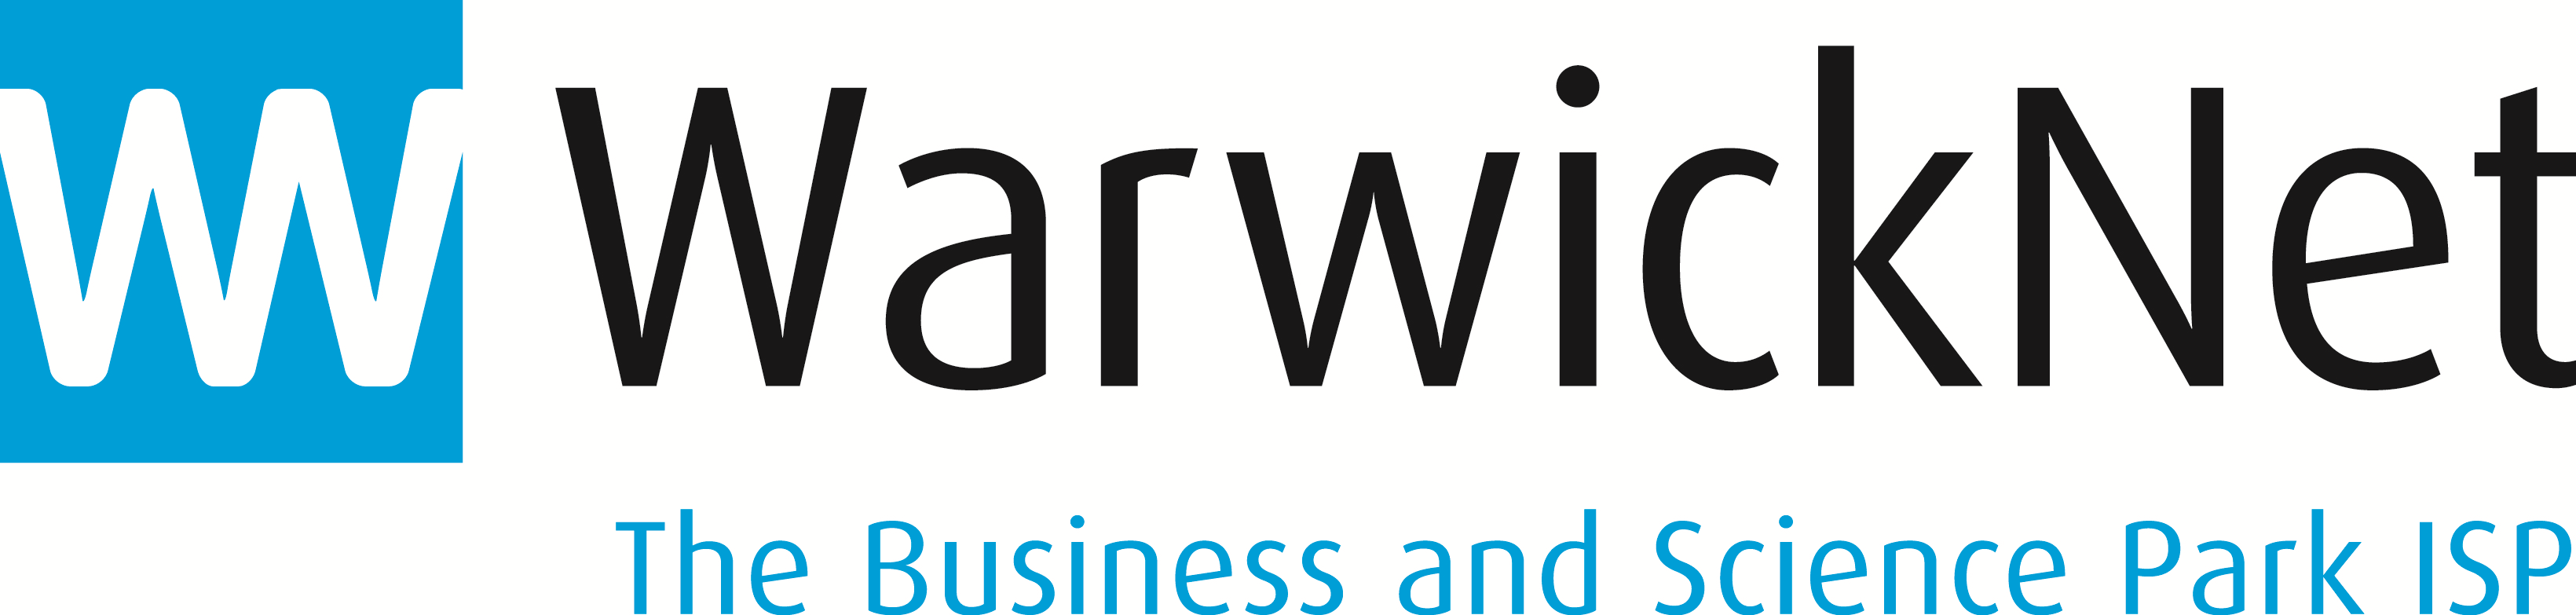 WarwickNet logo v1 cyan CMYK LARGE (1)